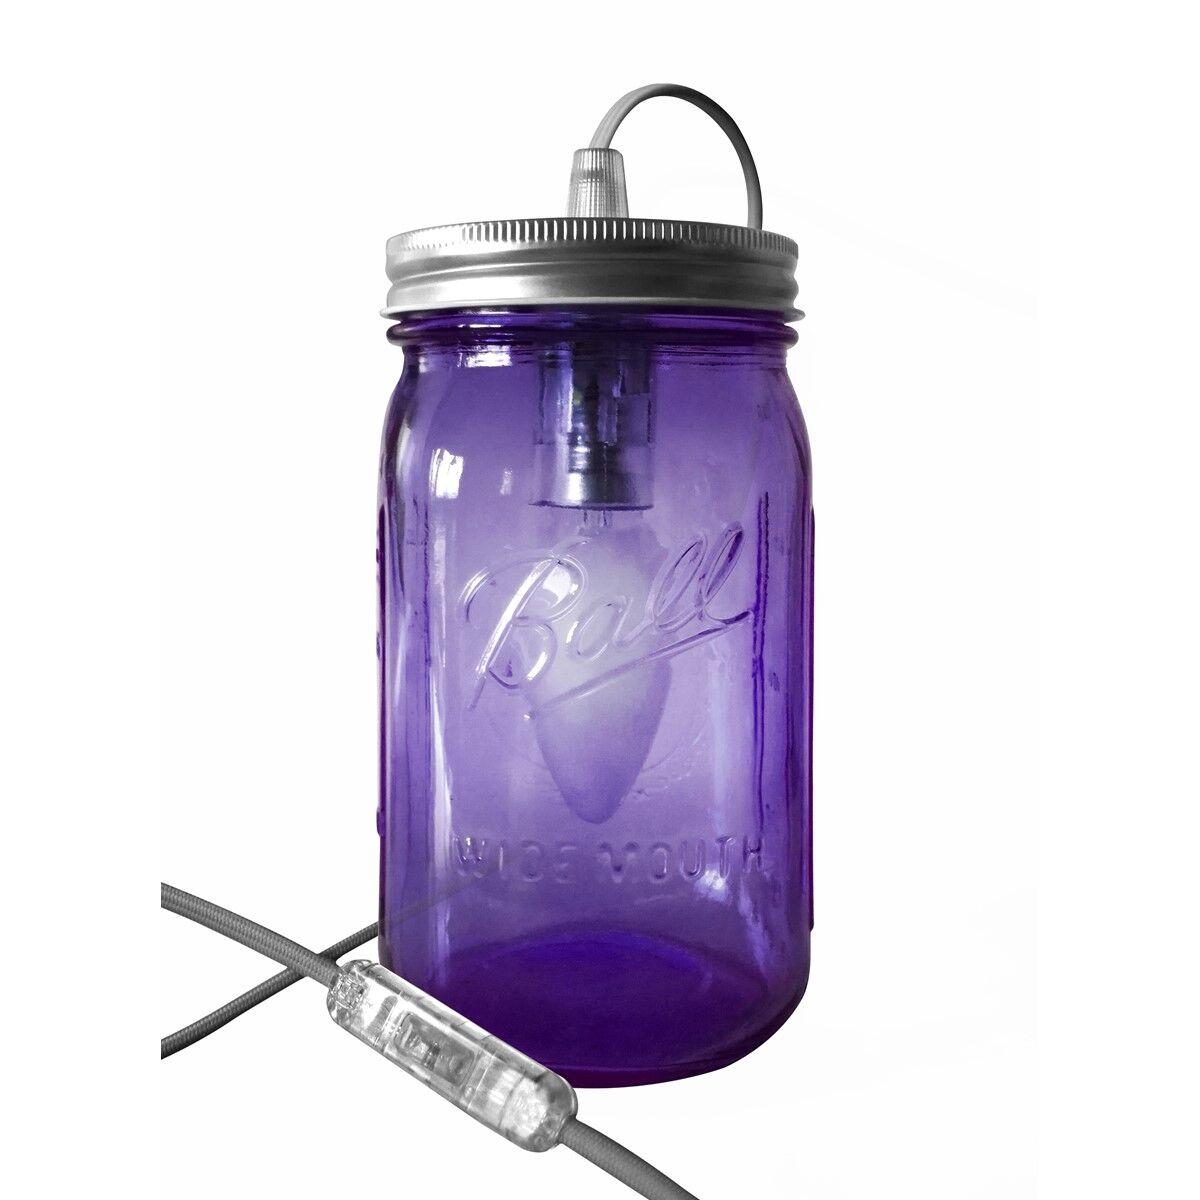 Fenel & Arno Lampe bocal en verre violet fil gris clair